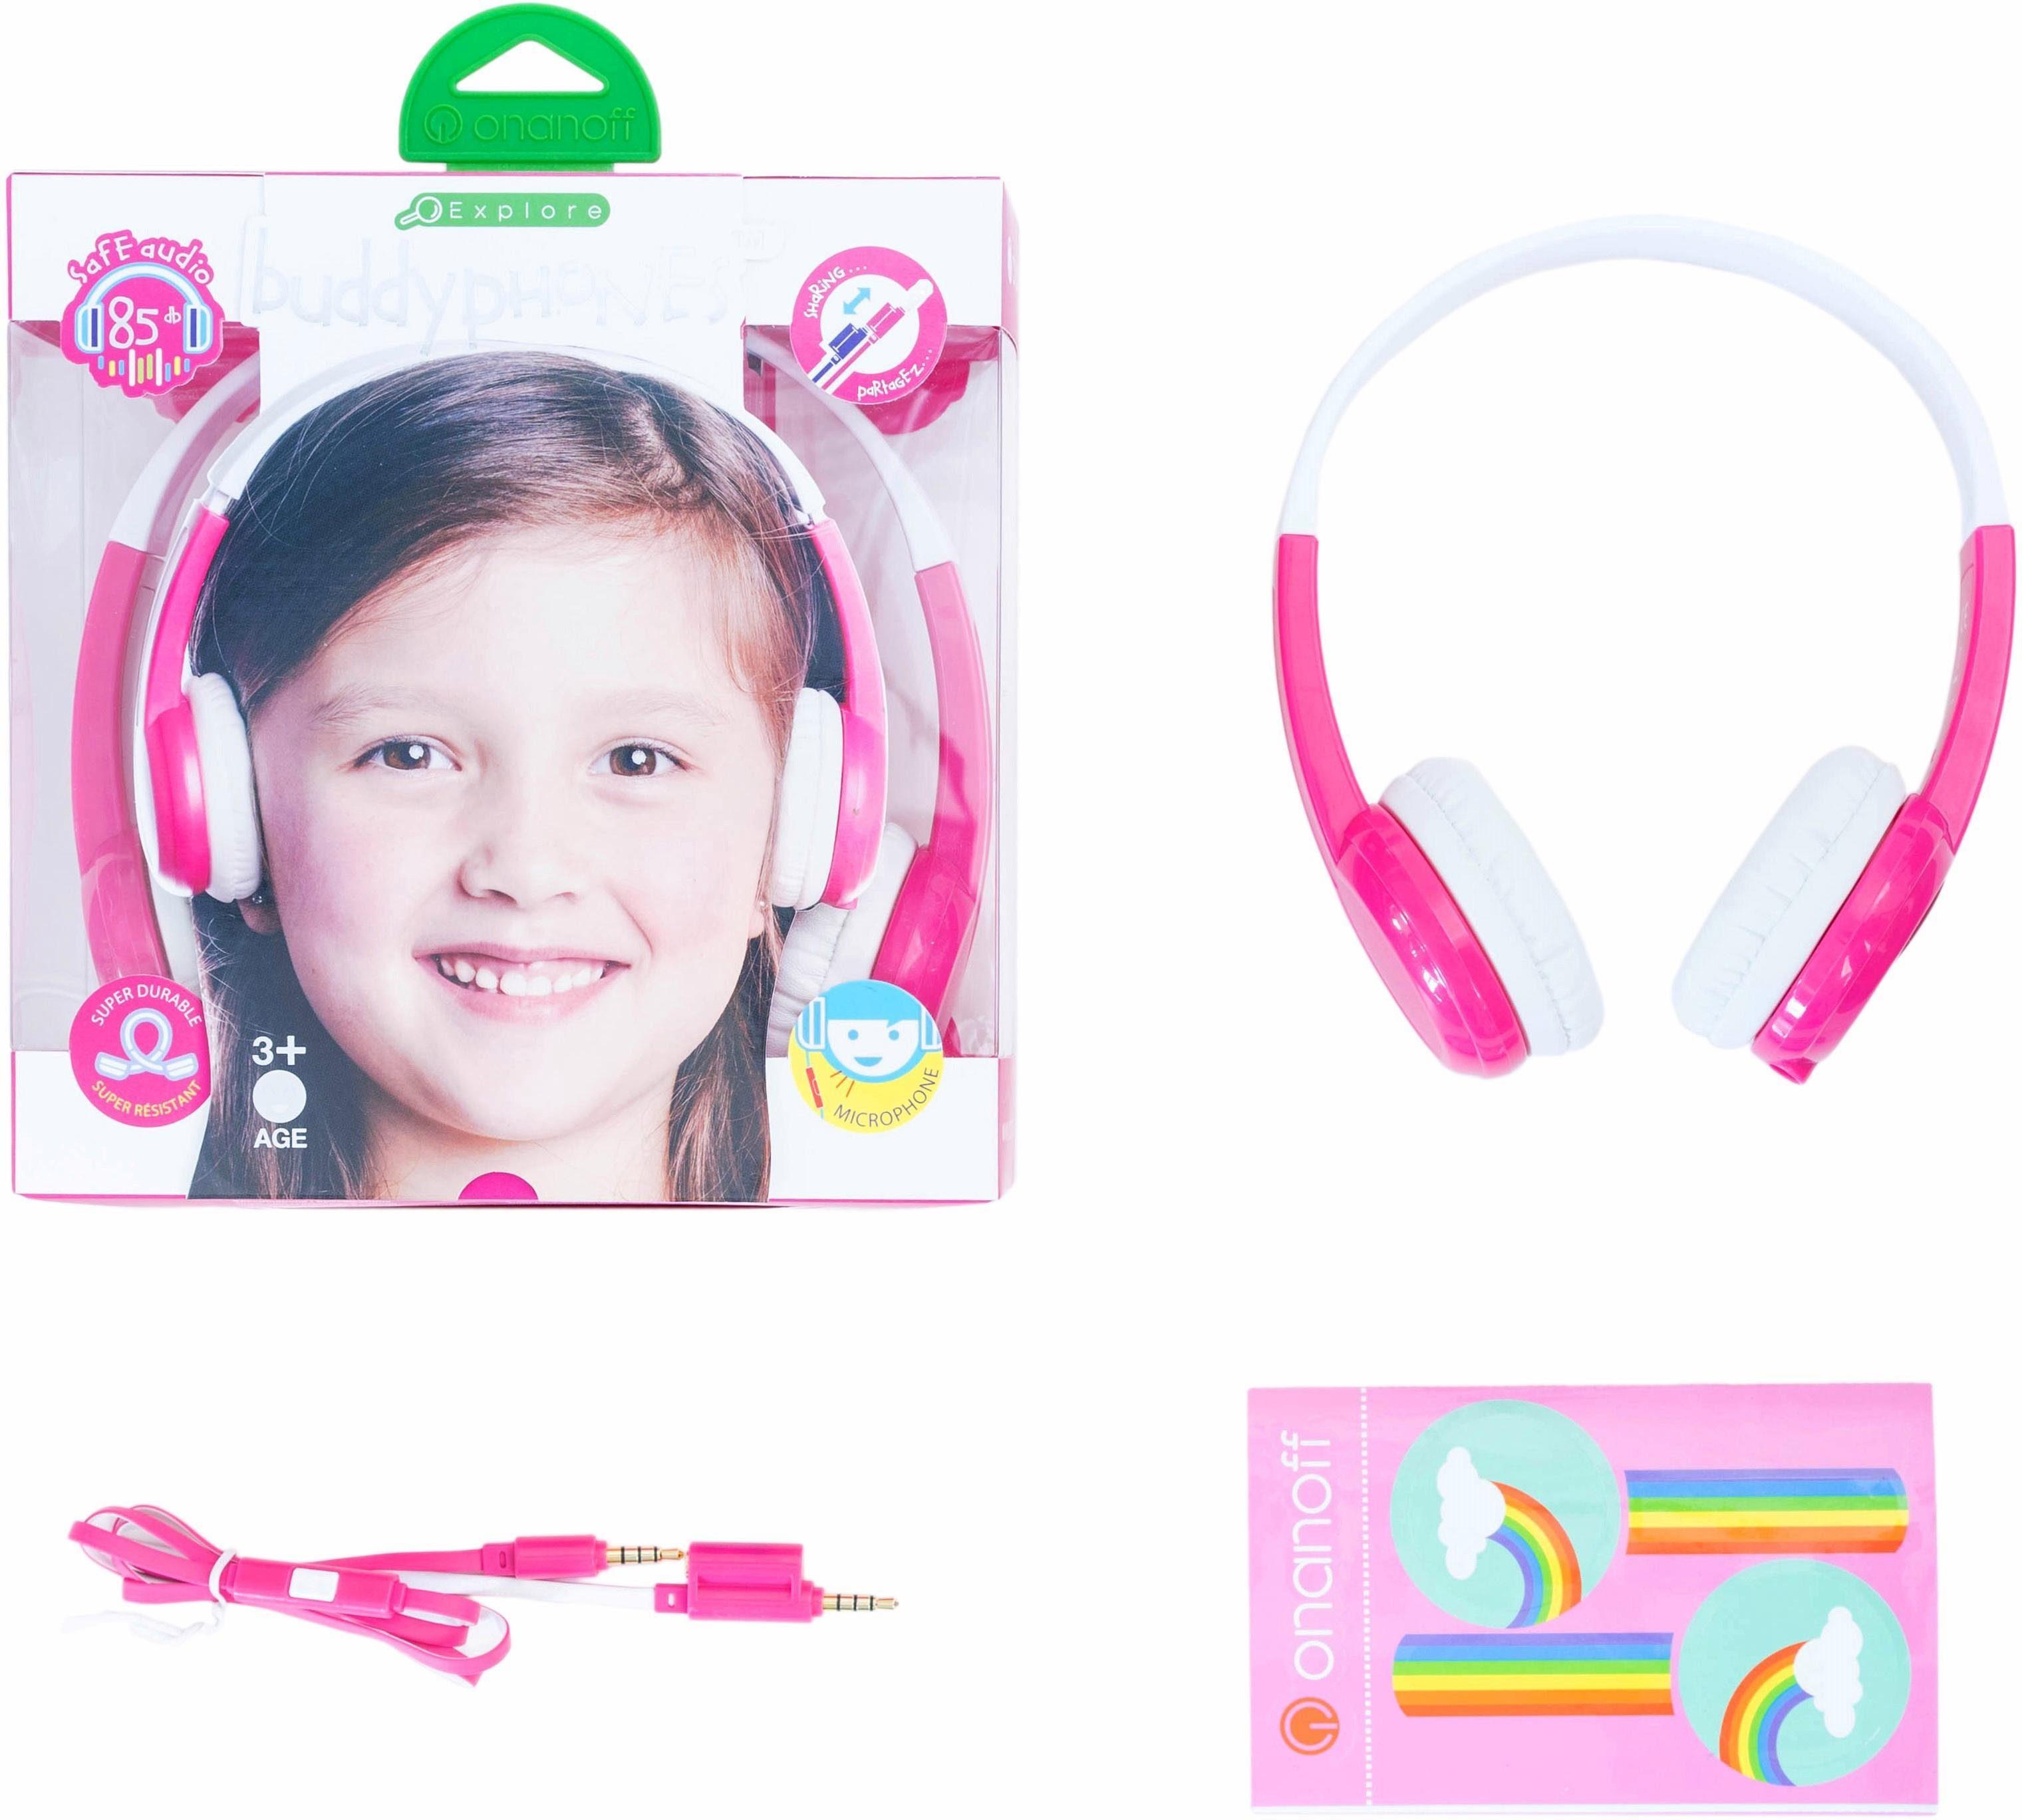 buddyphones™ Kinderkopfhörer, »Explore pink«